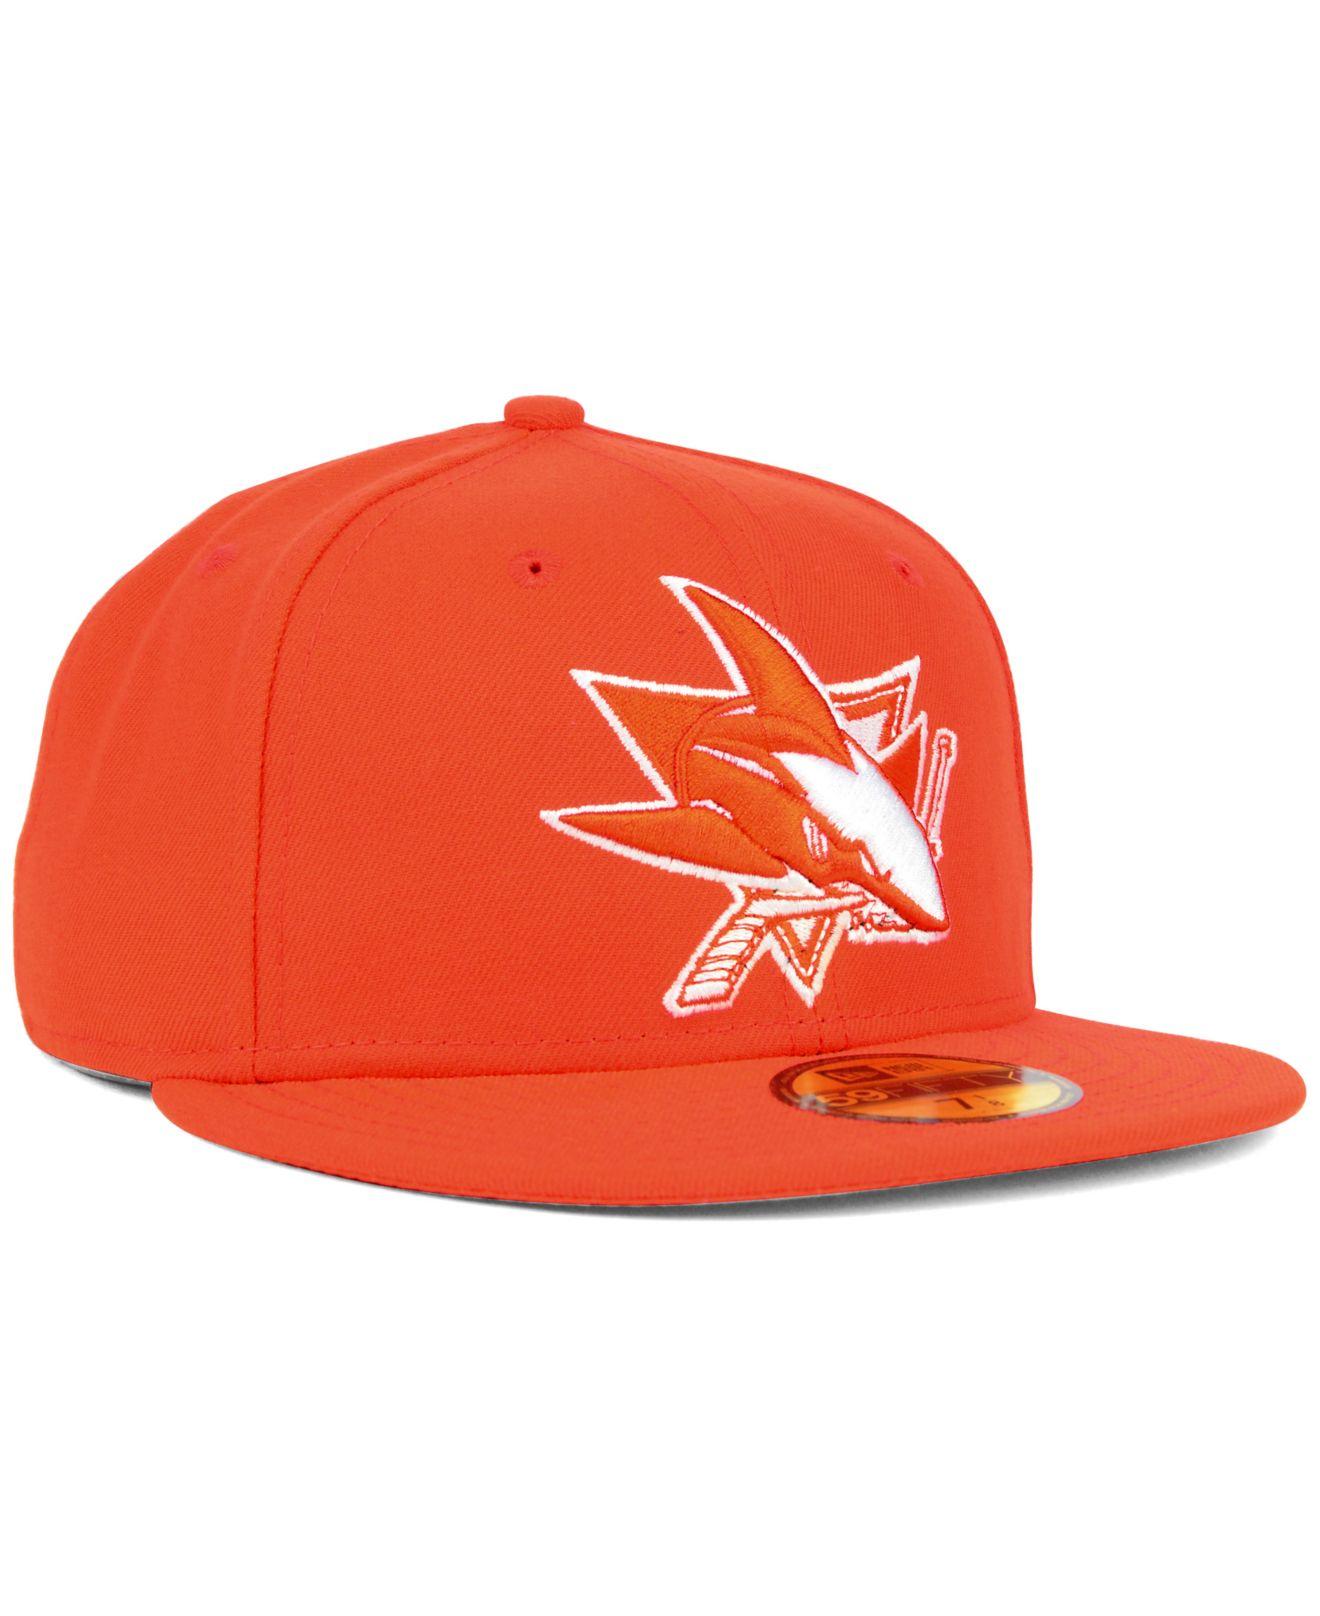 new concept ff089 08ef4 KTZ San Jose Sharks C-dub 59fifty Cap in Orange for Men - Lyst